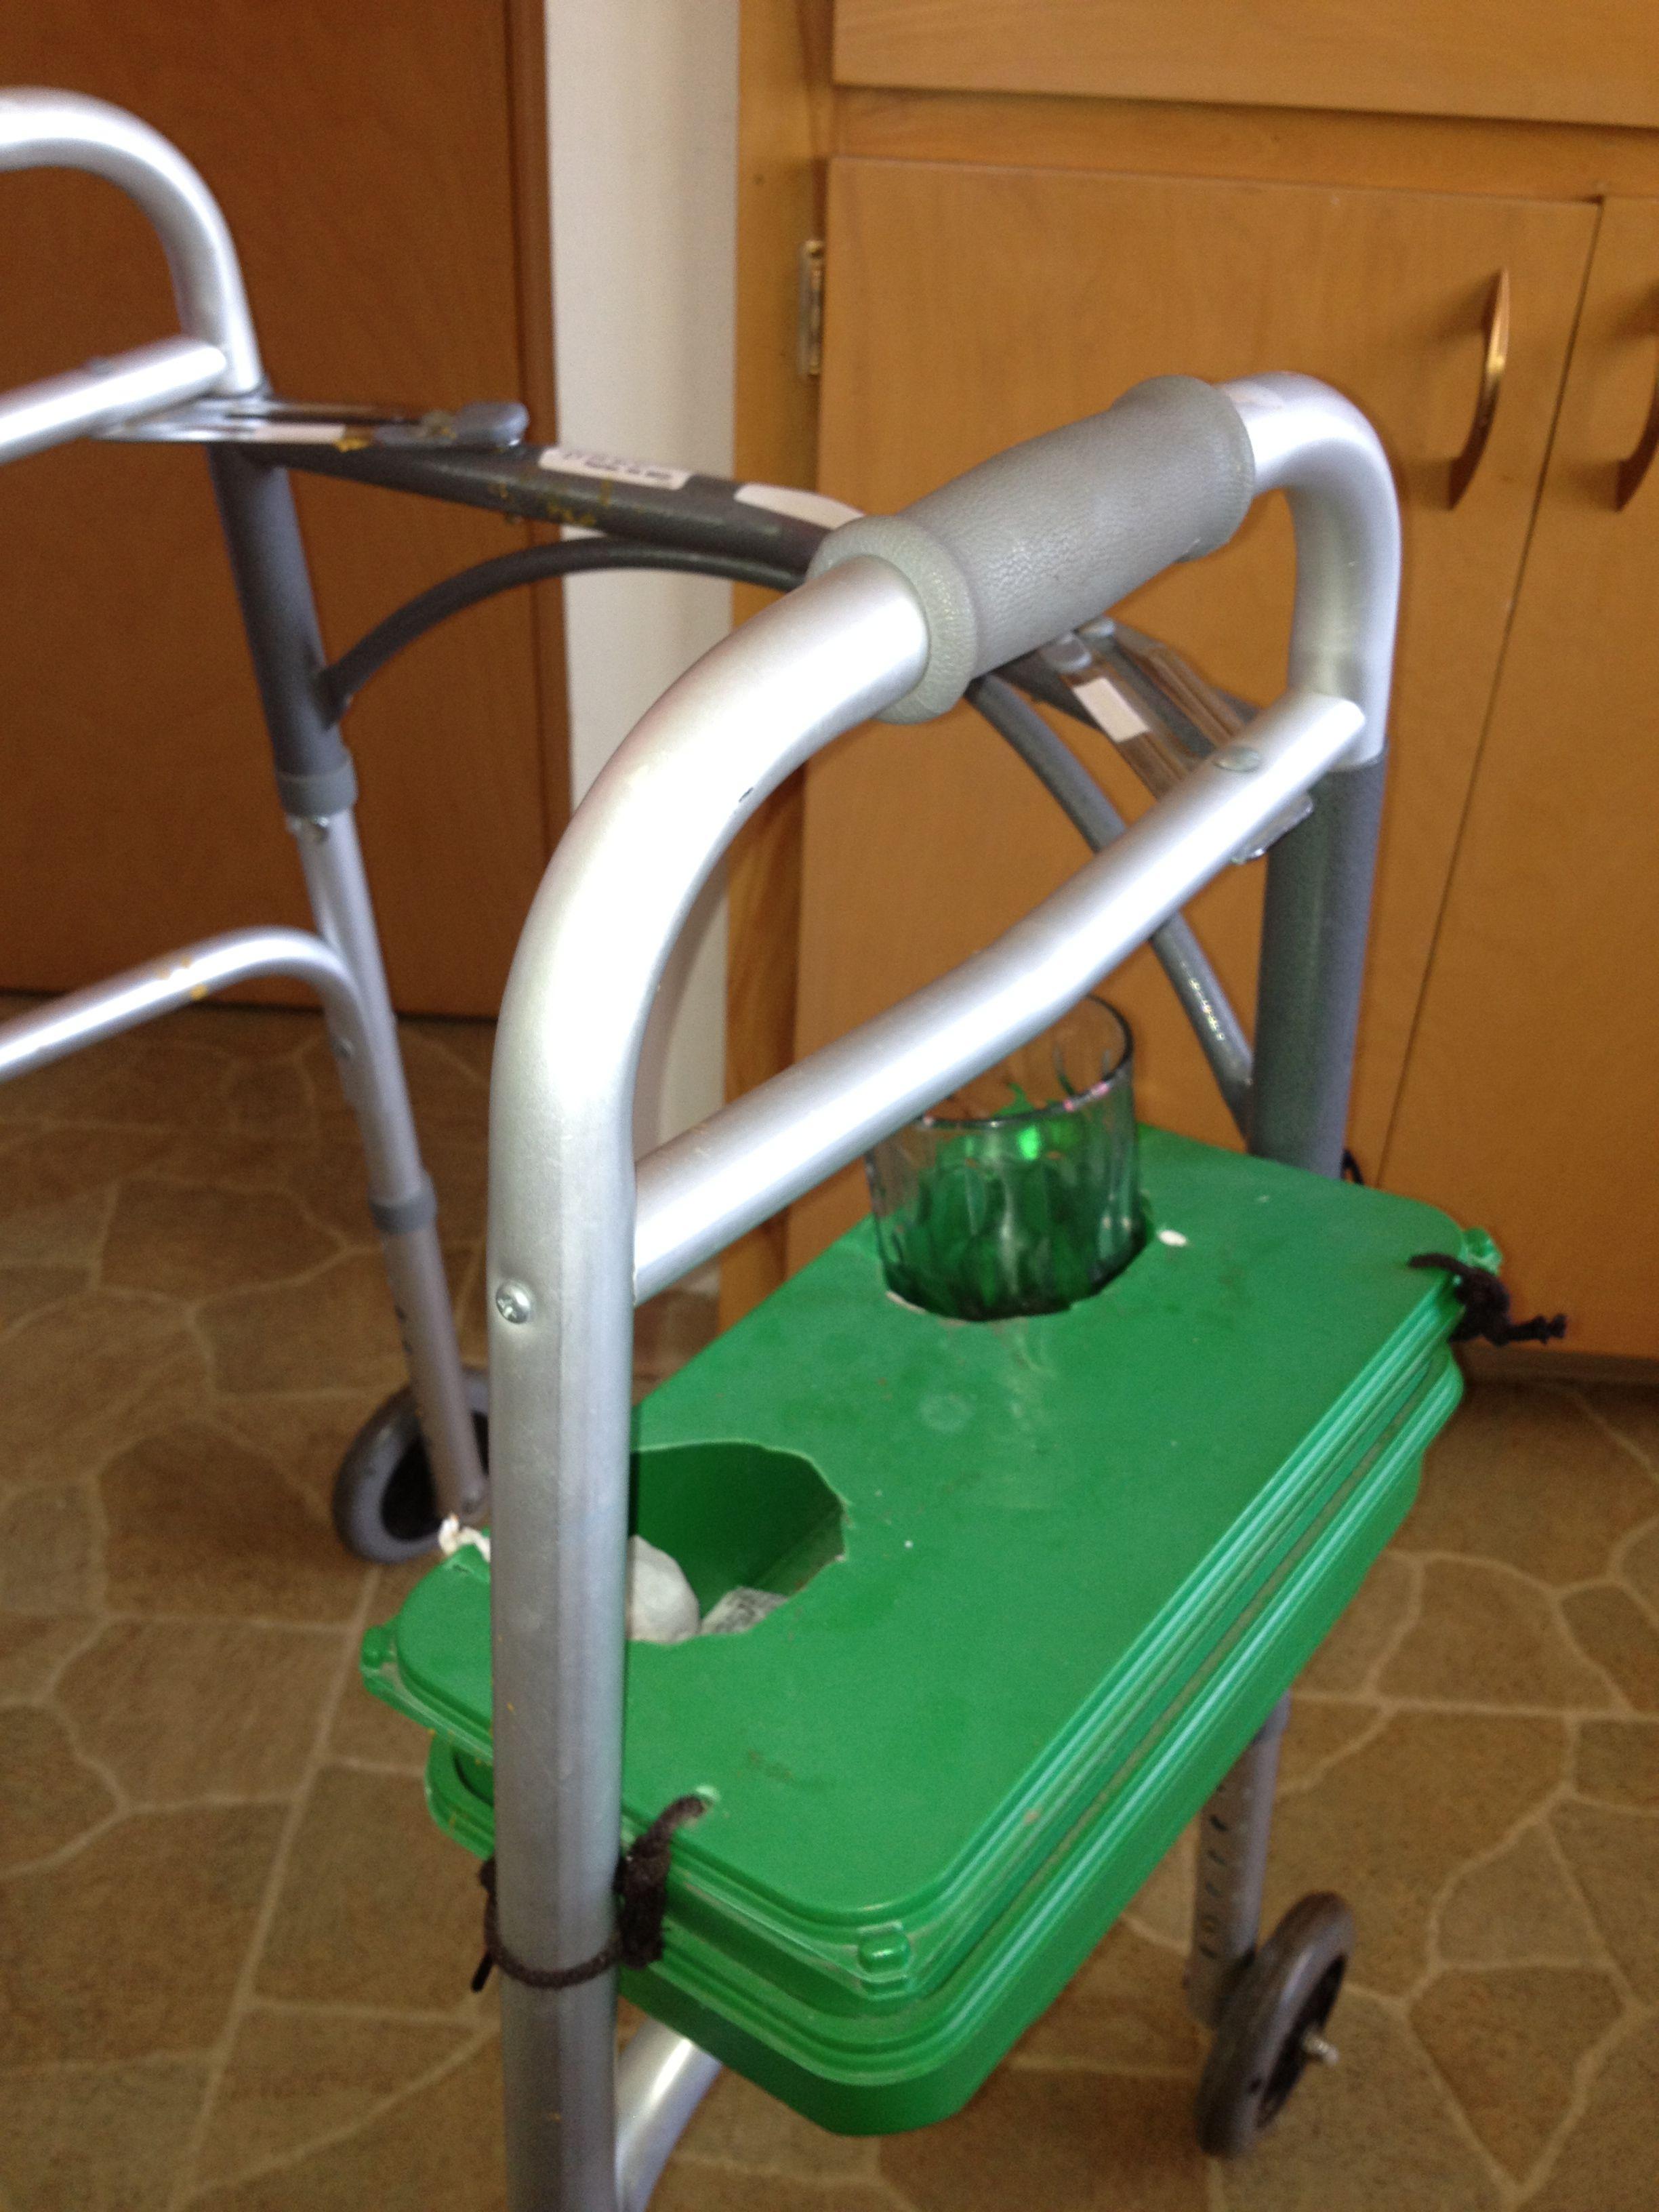 Walker Beverage Carrier Designed By A Home Health Client